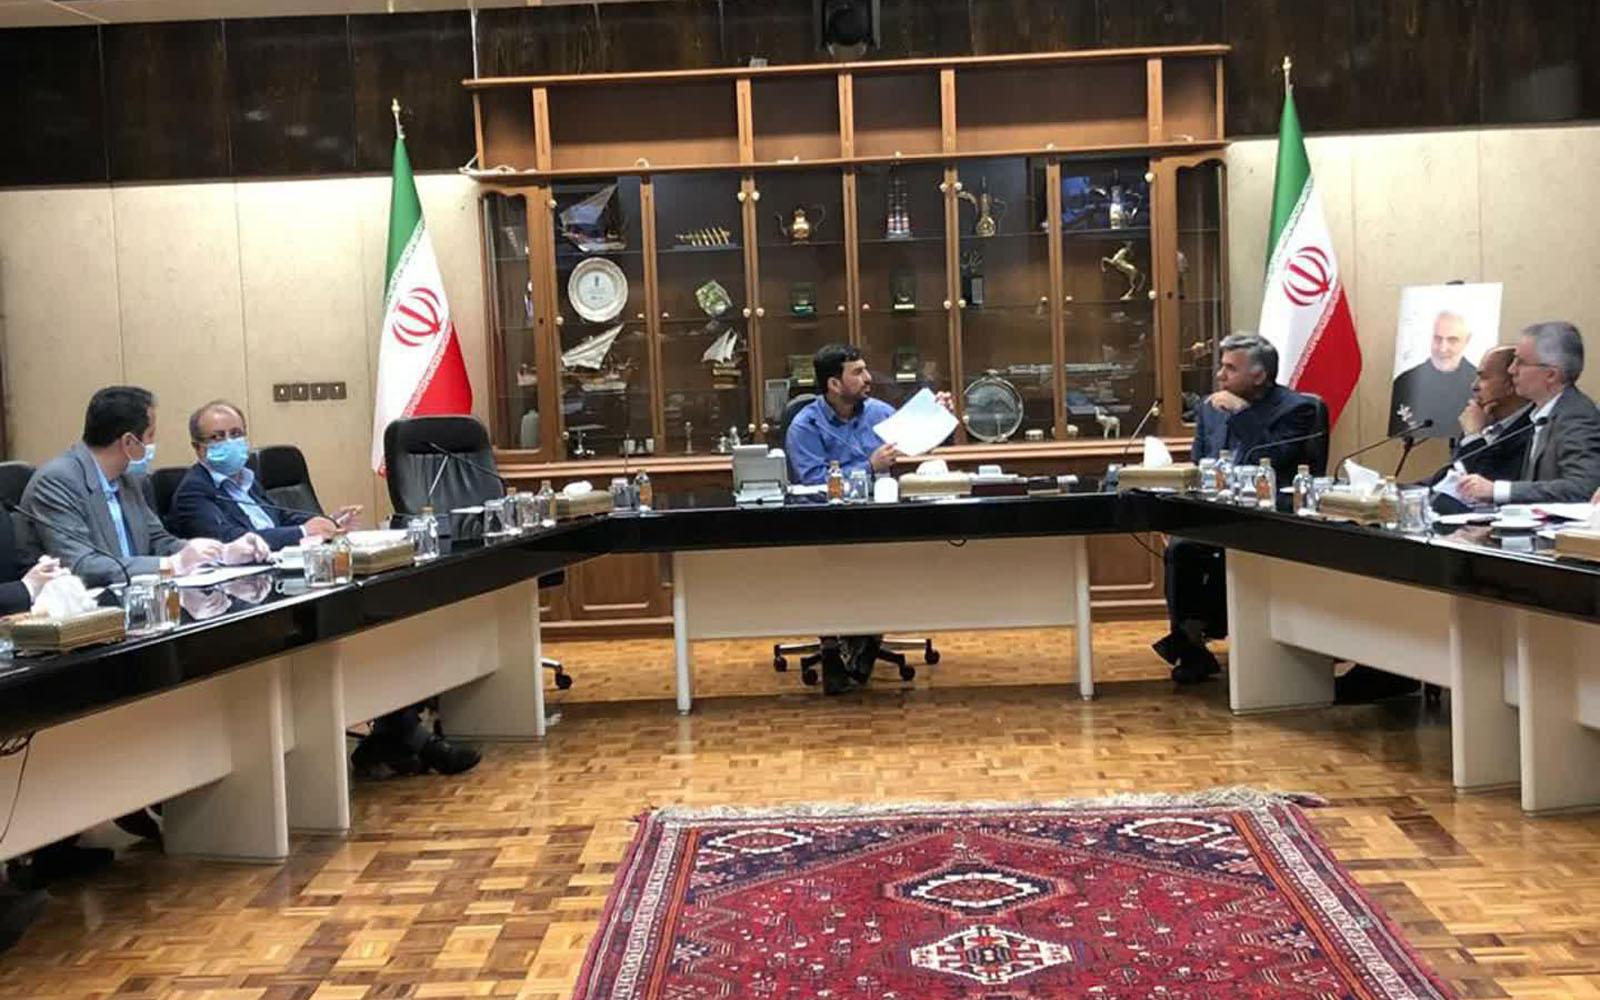 Photo of تاکید سرپرست وزارت صمت بر تامین مواد اولیه و توسعه صادرات در دیدار مسئولین ذوب آهن